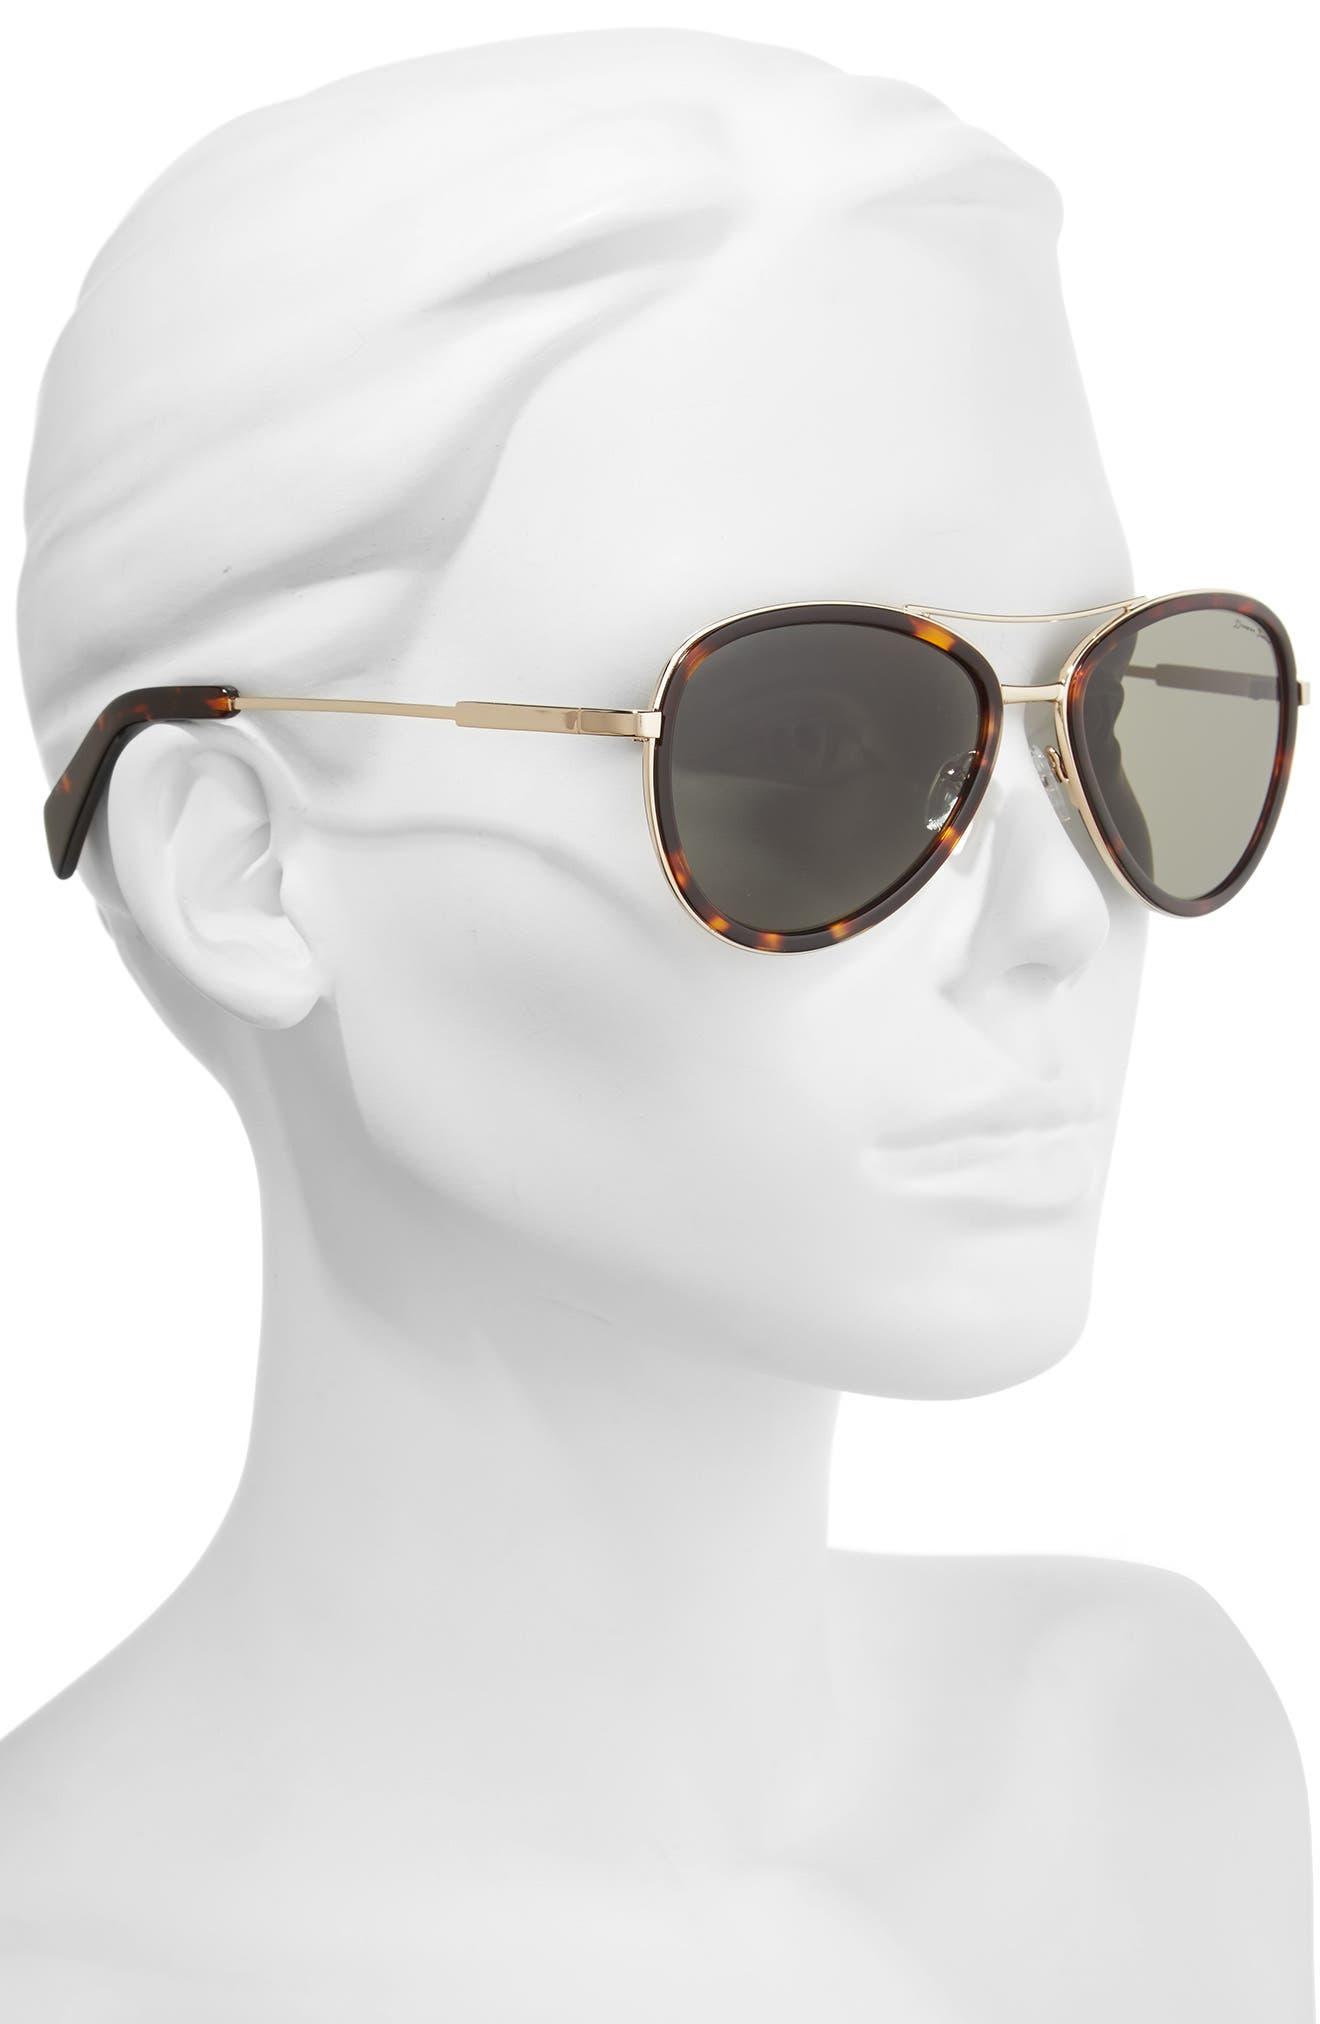 58mm Aviator Sunglasses,                             Alternate thumbnail 2, color,                             GOLD